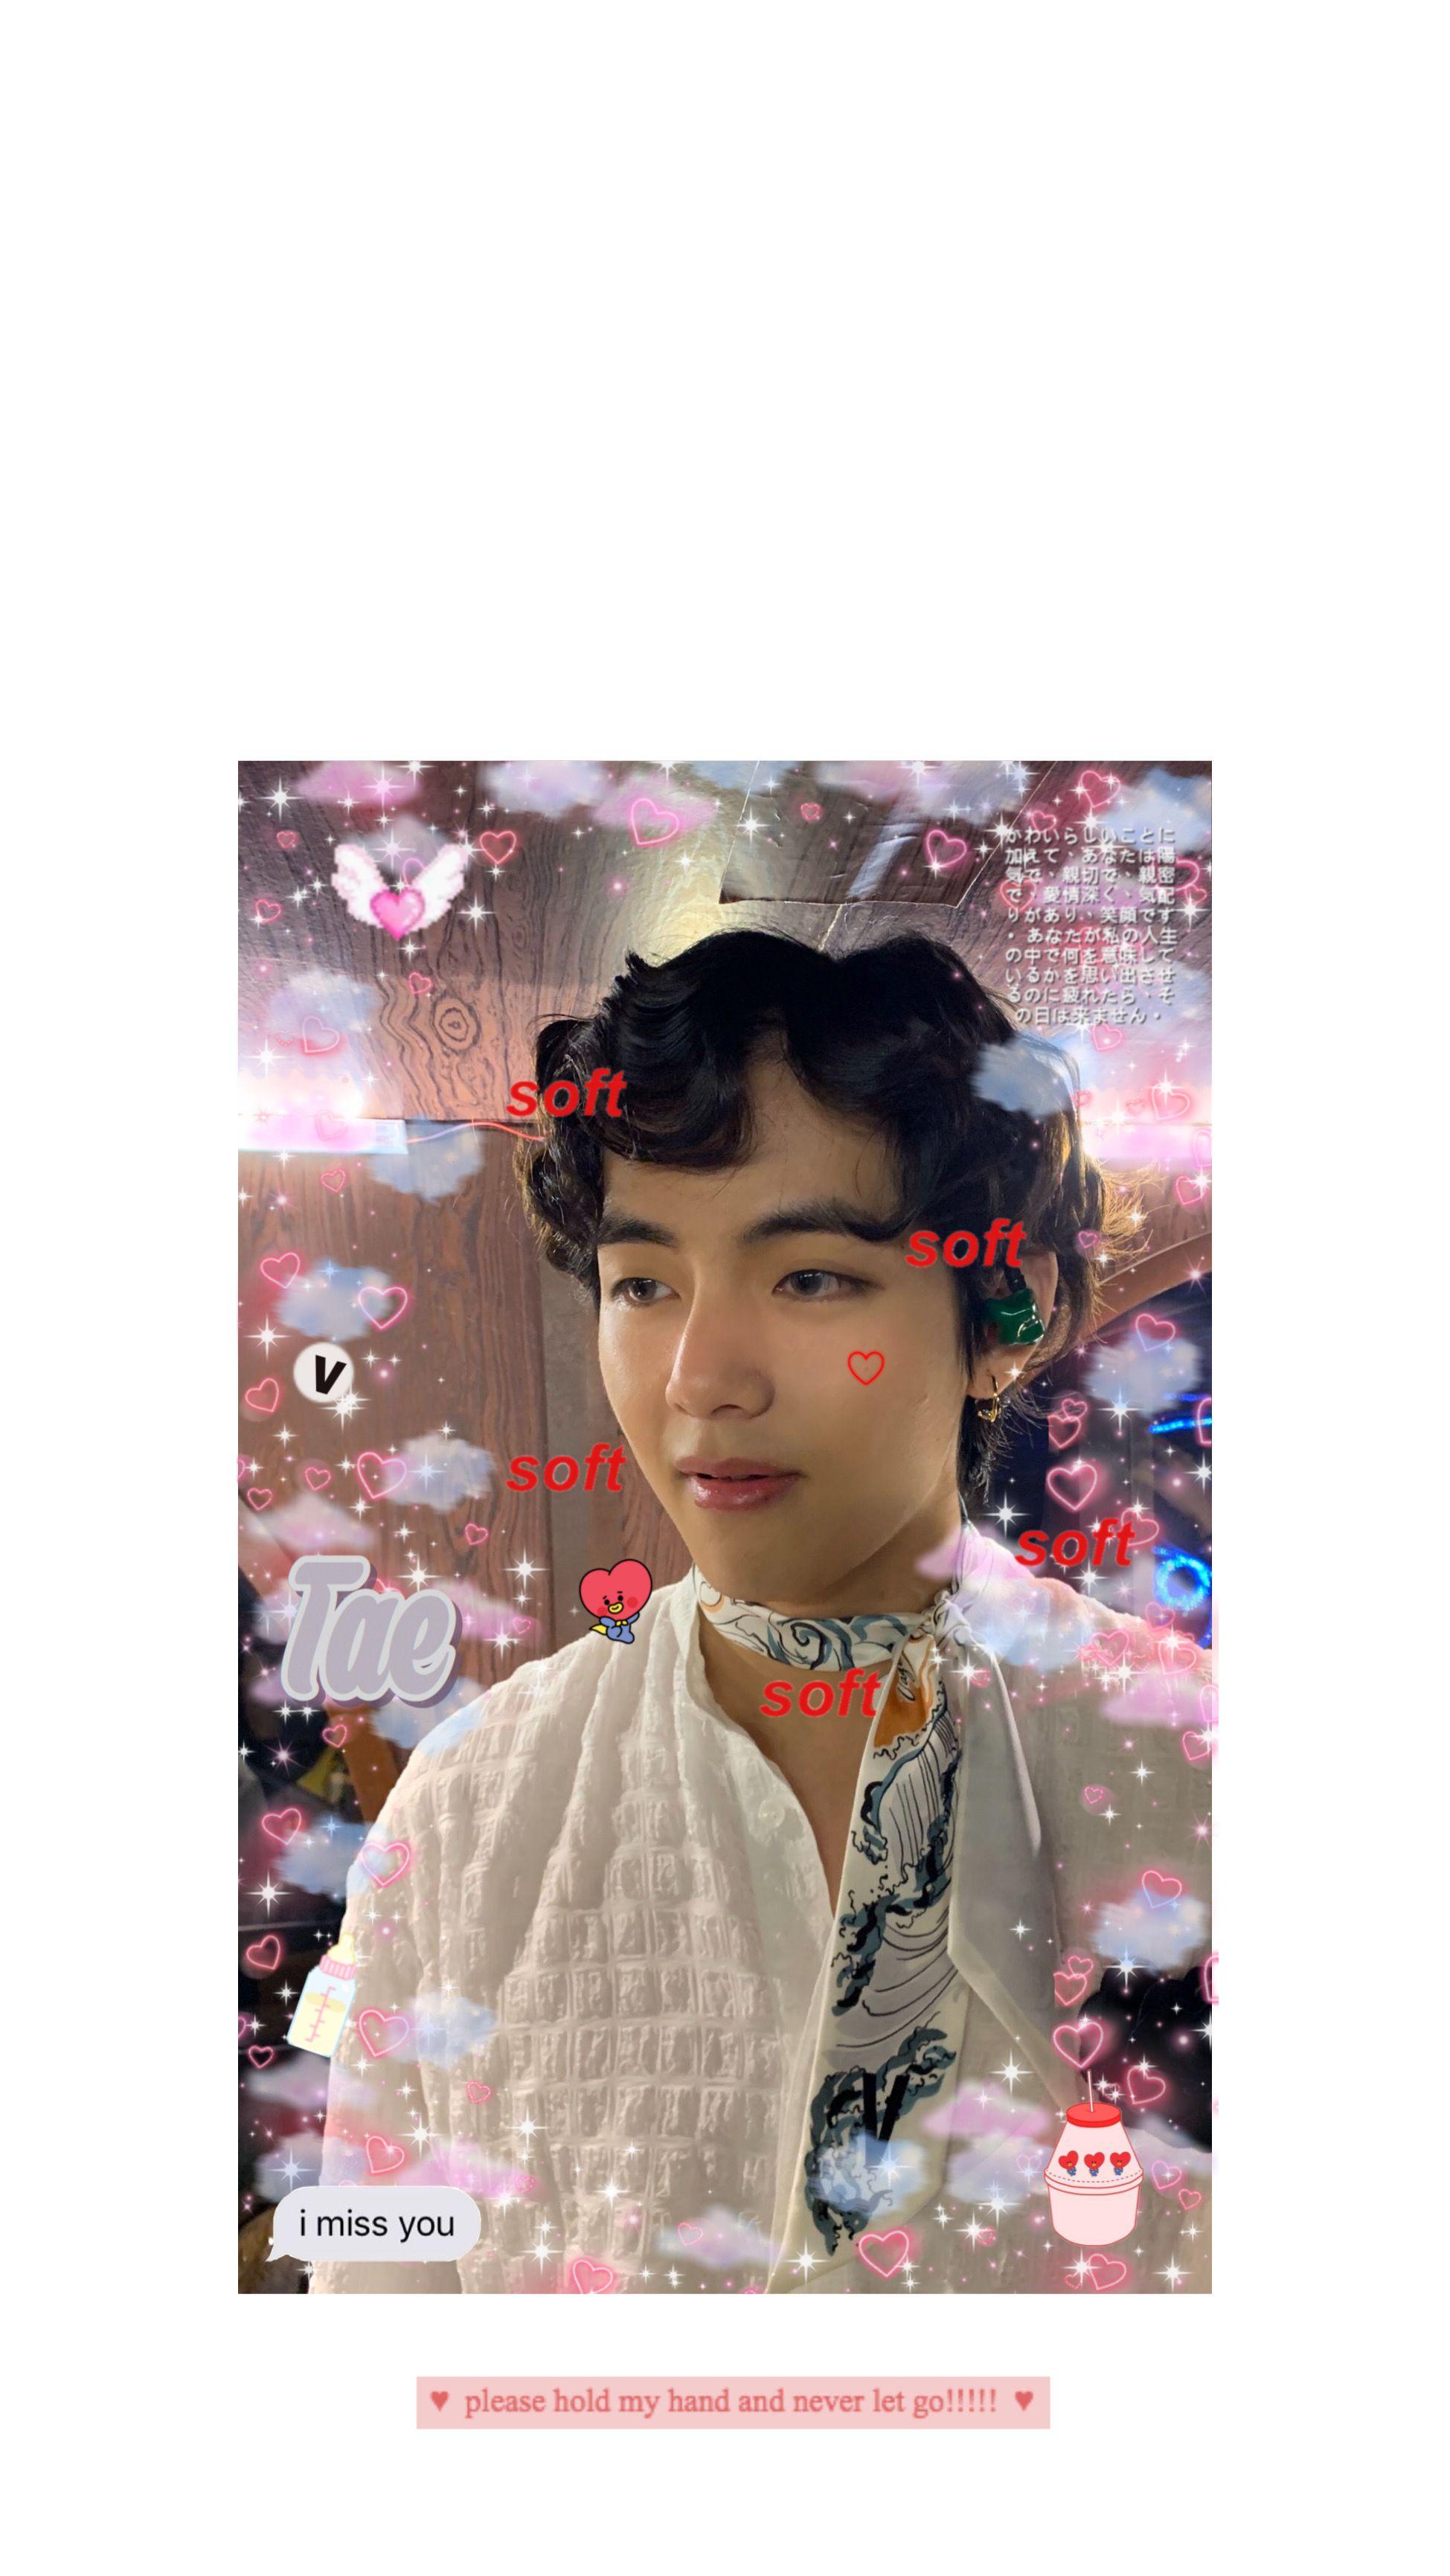 Soft Cute Messy Taehyung Kimtaehyung V Btsv Bts Army Bangtan Aesthetic Kpop Wallpaper Lockscreen In 2020 Bts Lockscreen Aesthetic Girl V Taehyung